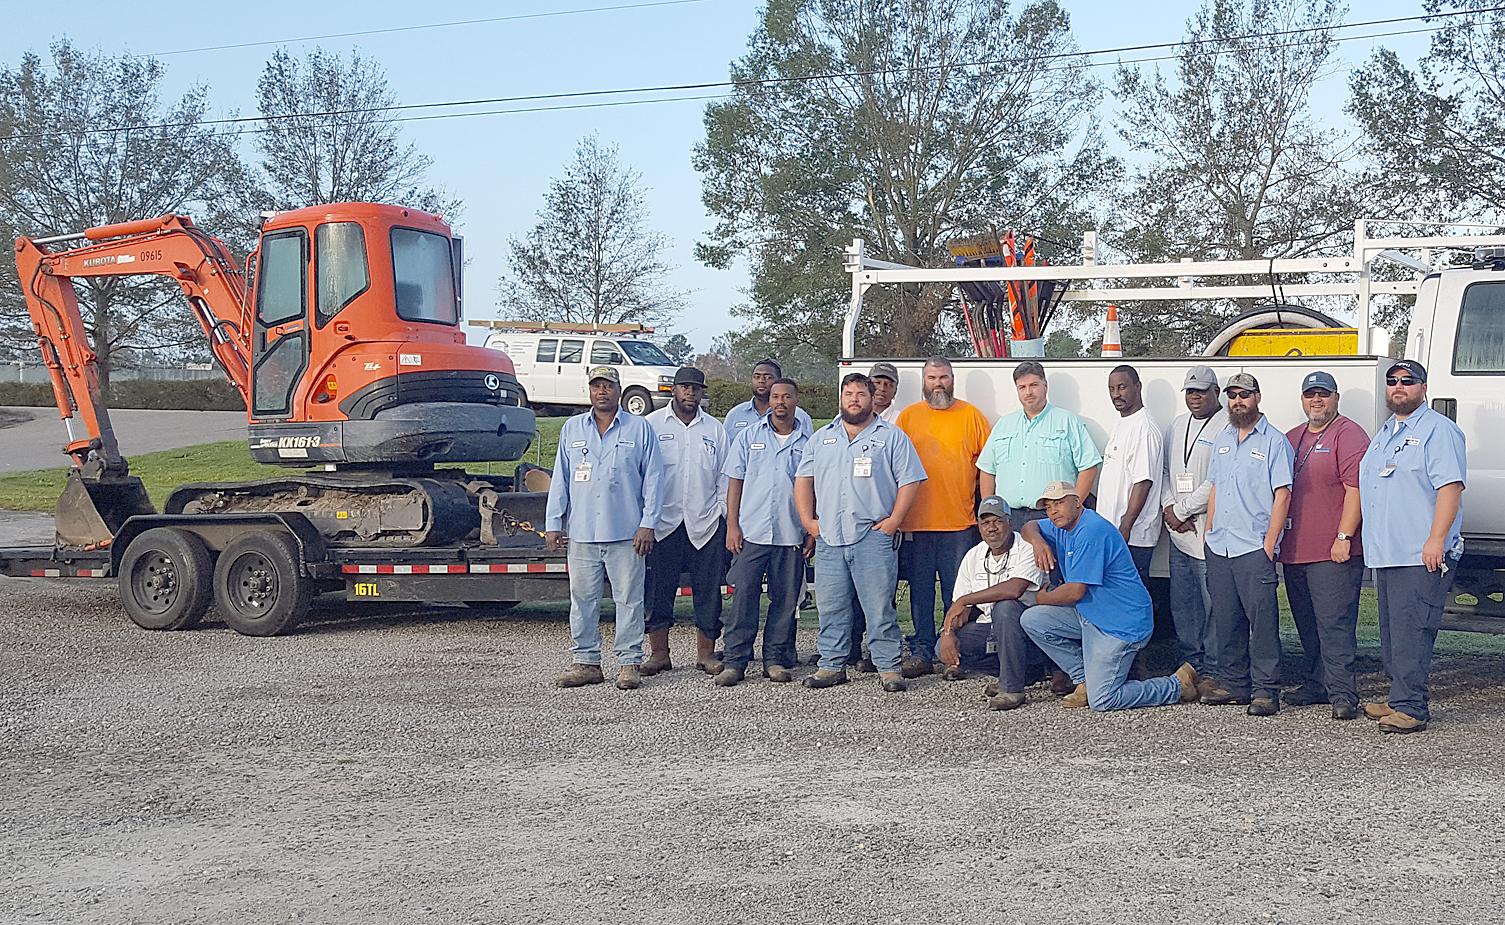 Cape Fear Public Utility Authority staff